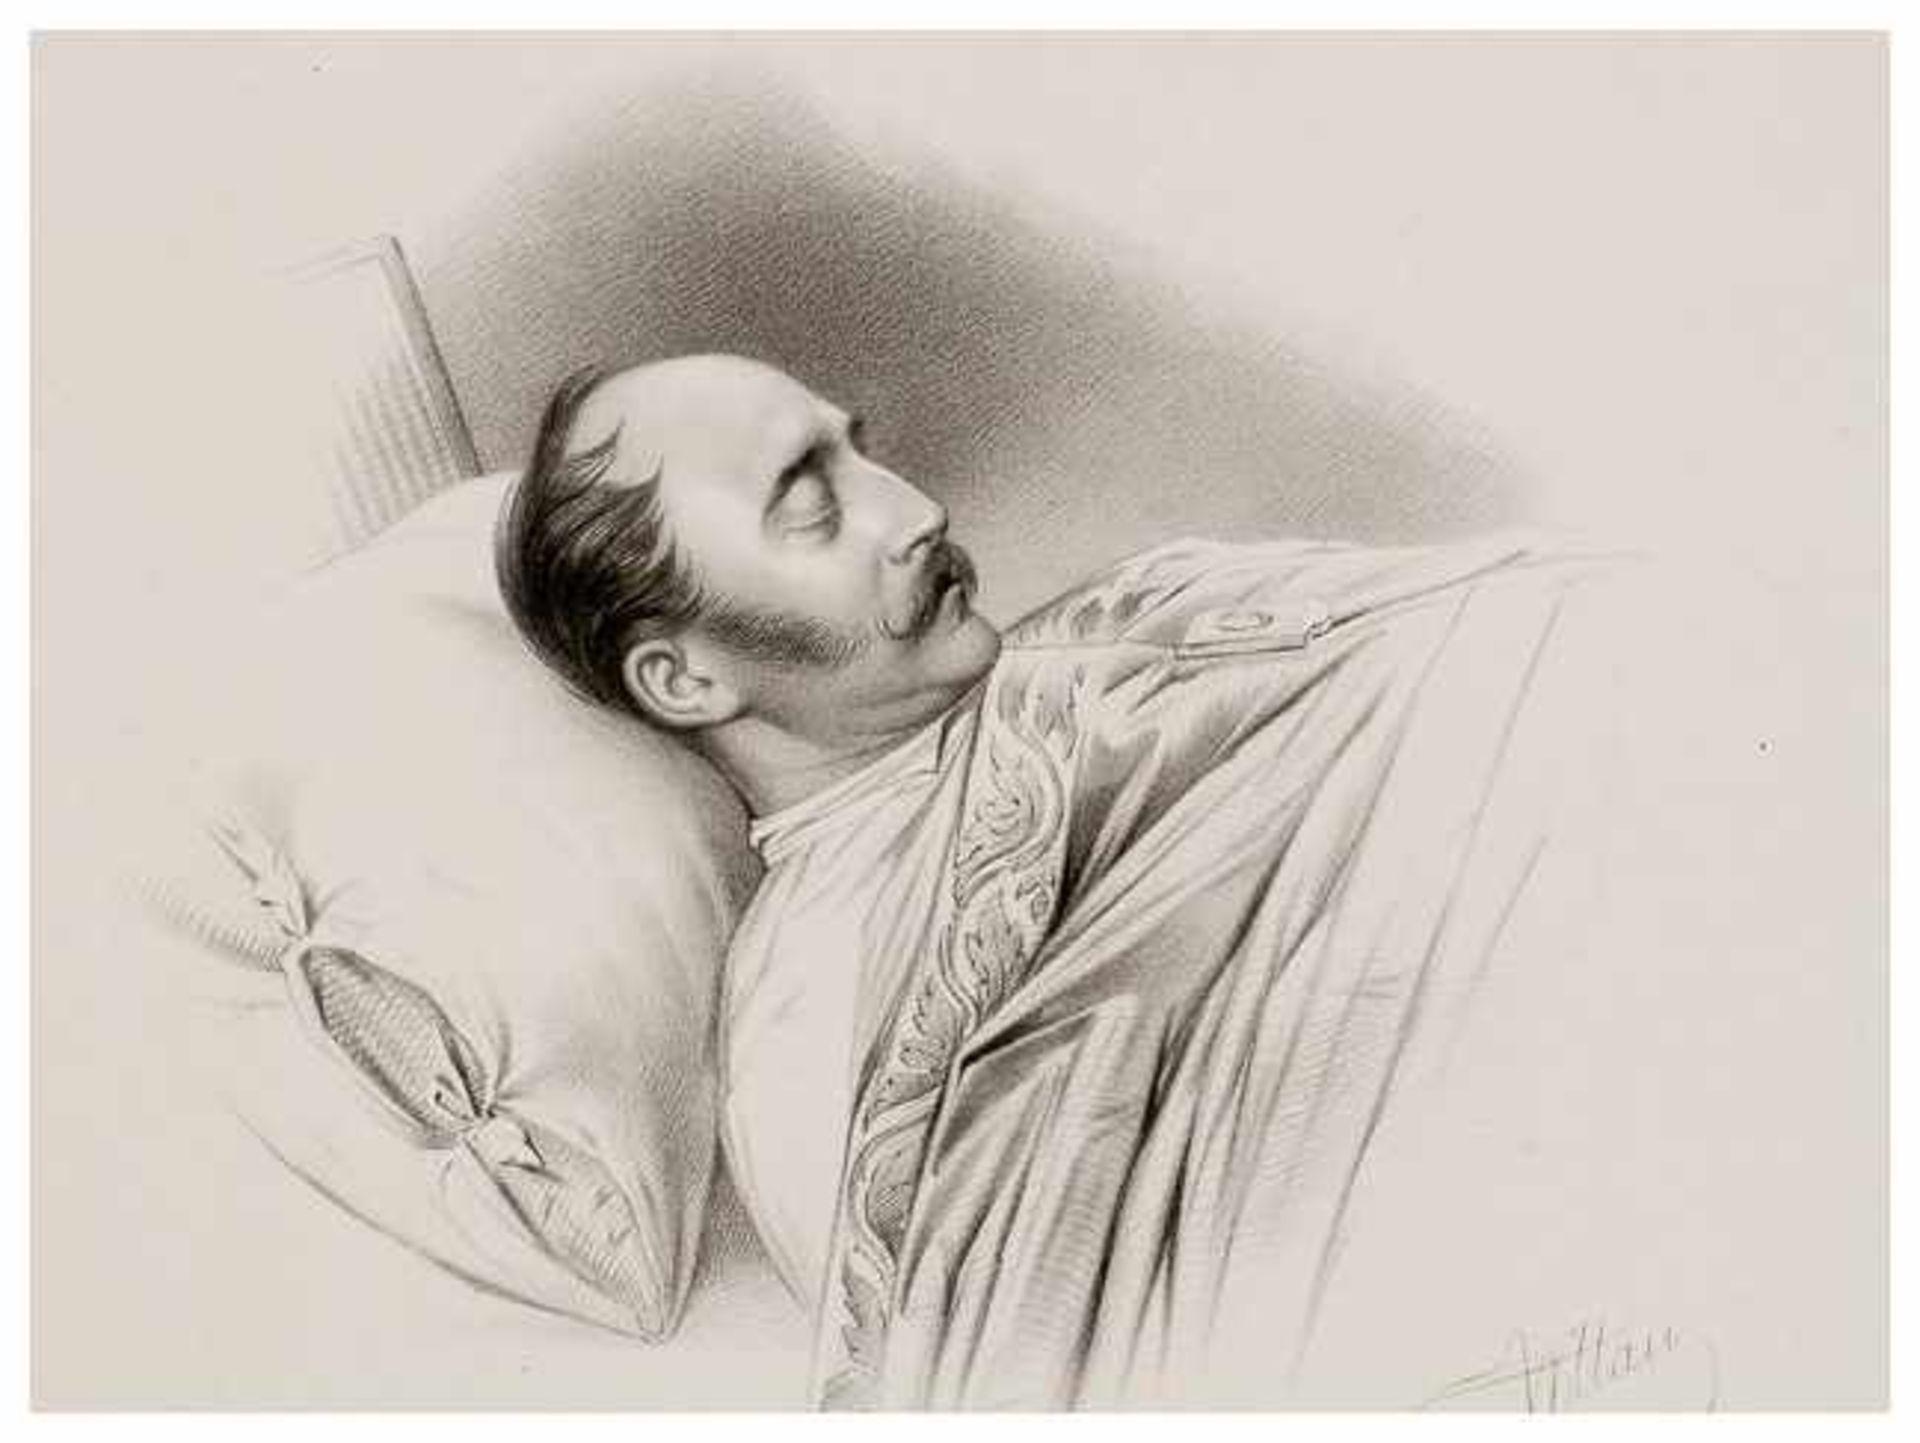 Los 44 - Zar Nikolaus I. auf dem Totenbett Lithographie, 18. Februar 1855 Papiergrösse: ca. 34,5 x 42,5 cm,